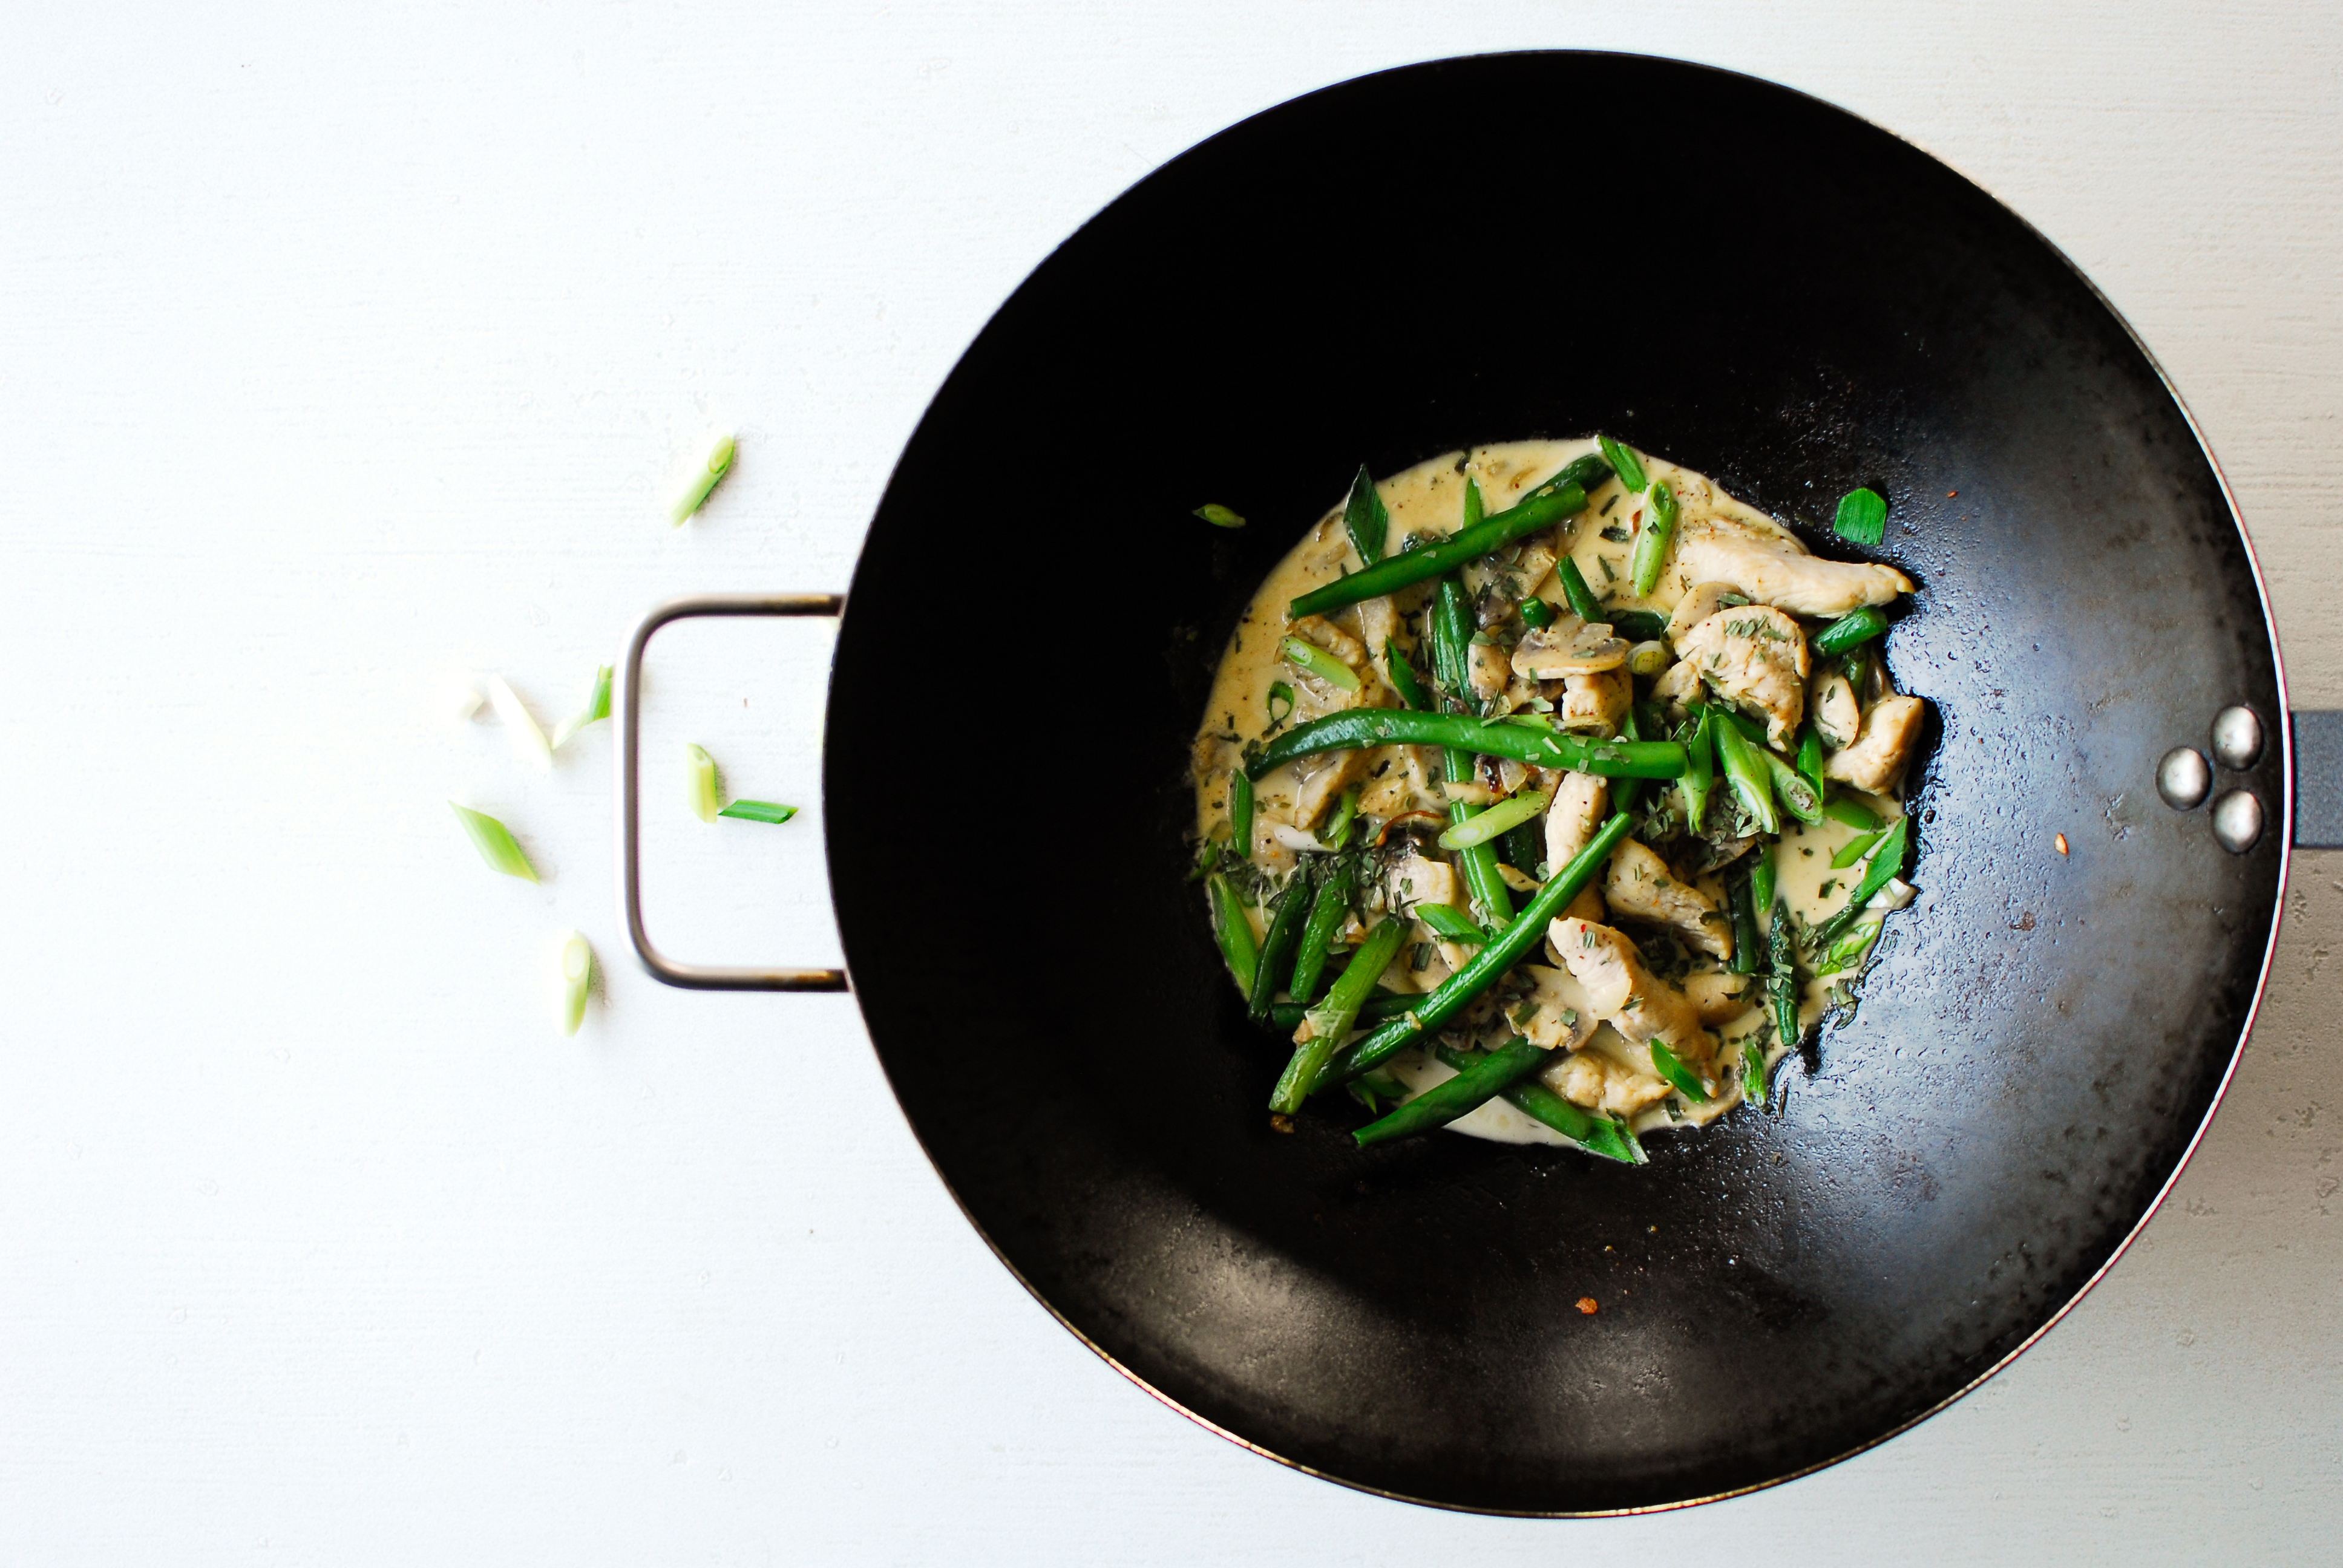 serving dumplings | Wok met kip en sperziebonen